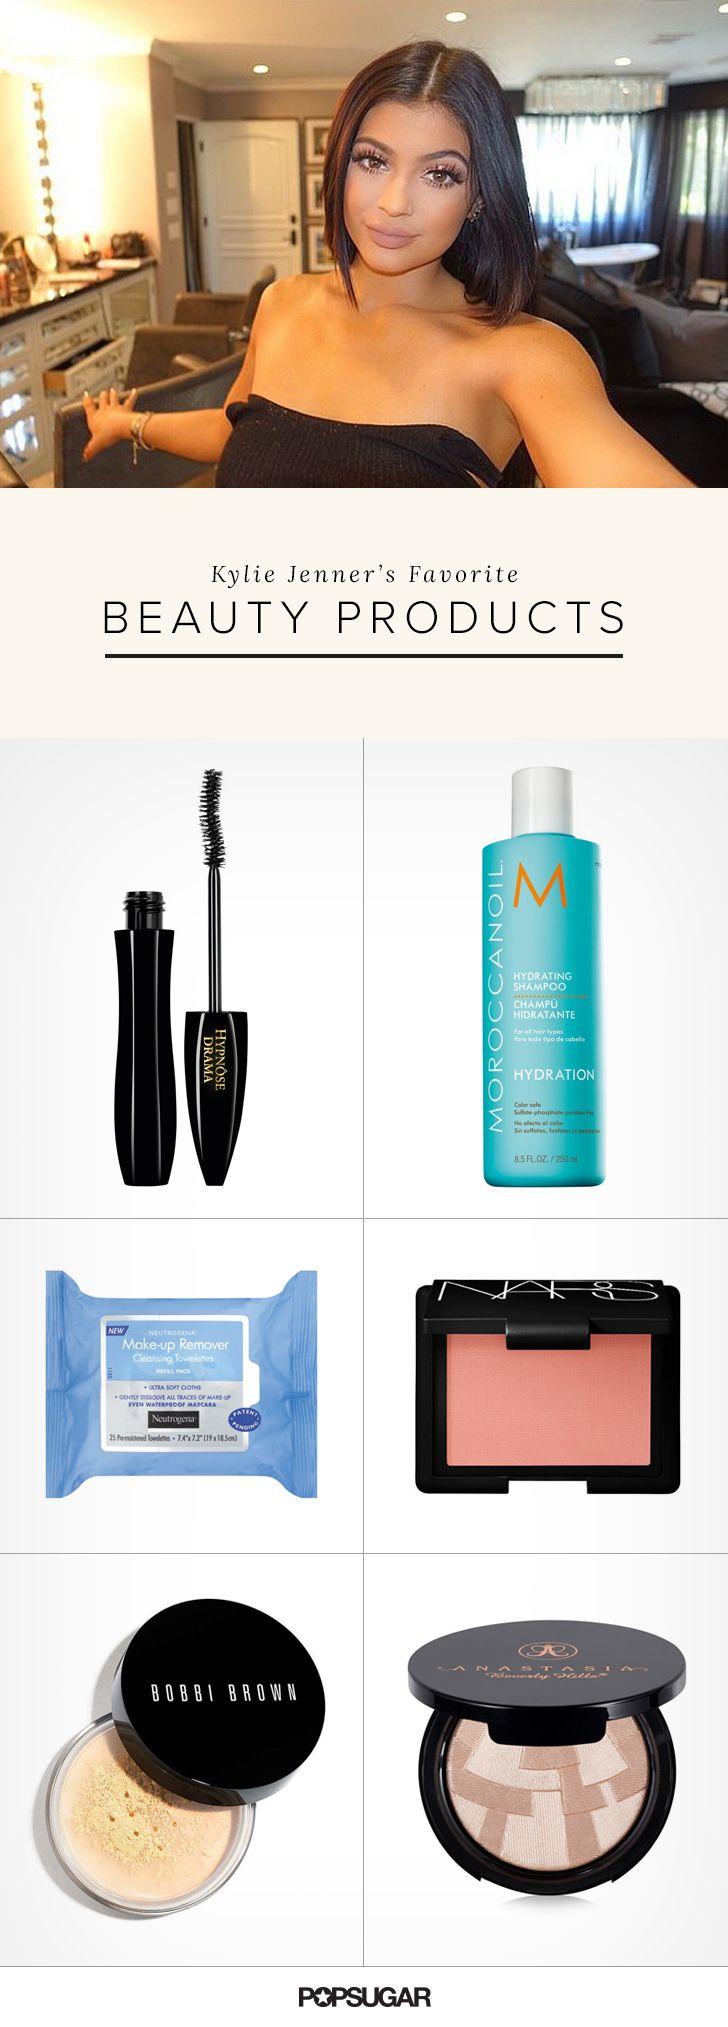 Every single product you need to look like Kylie Jenner!